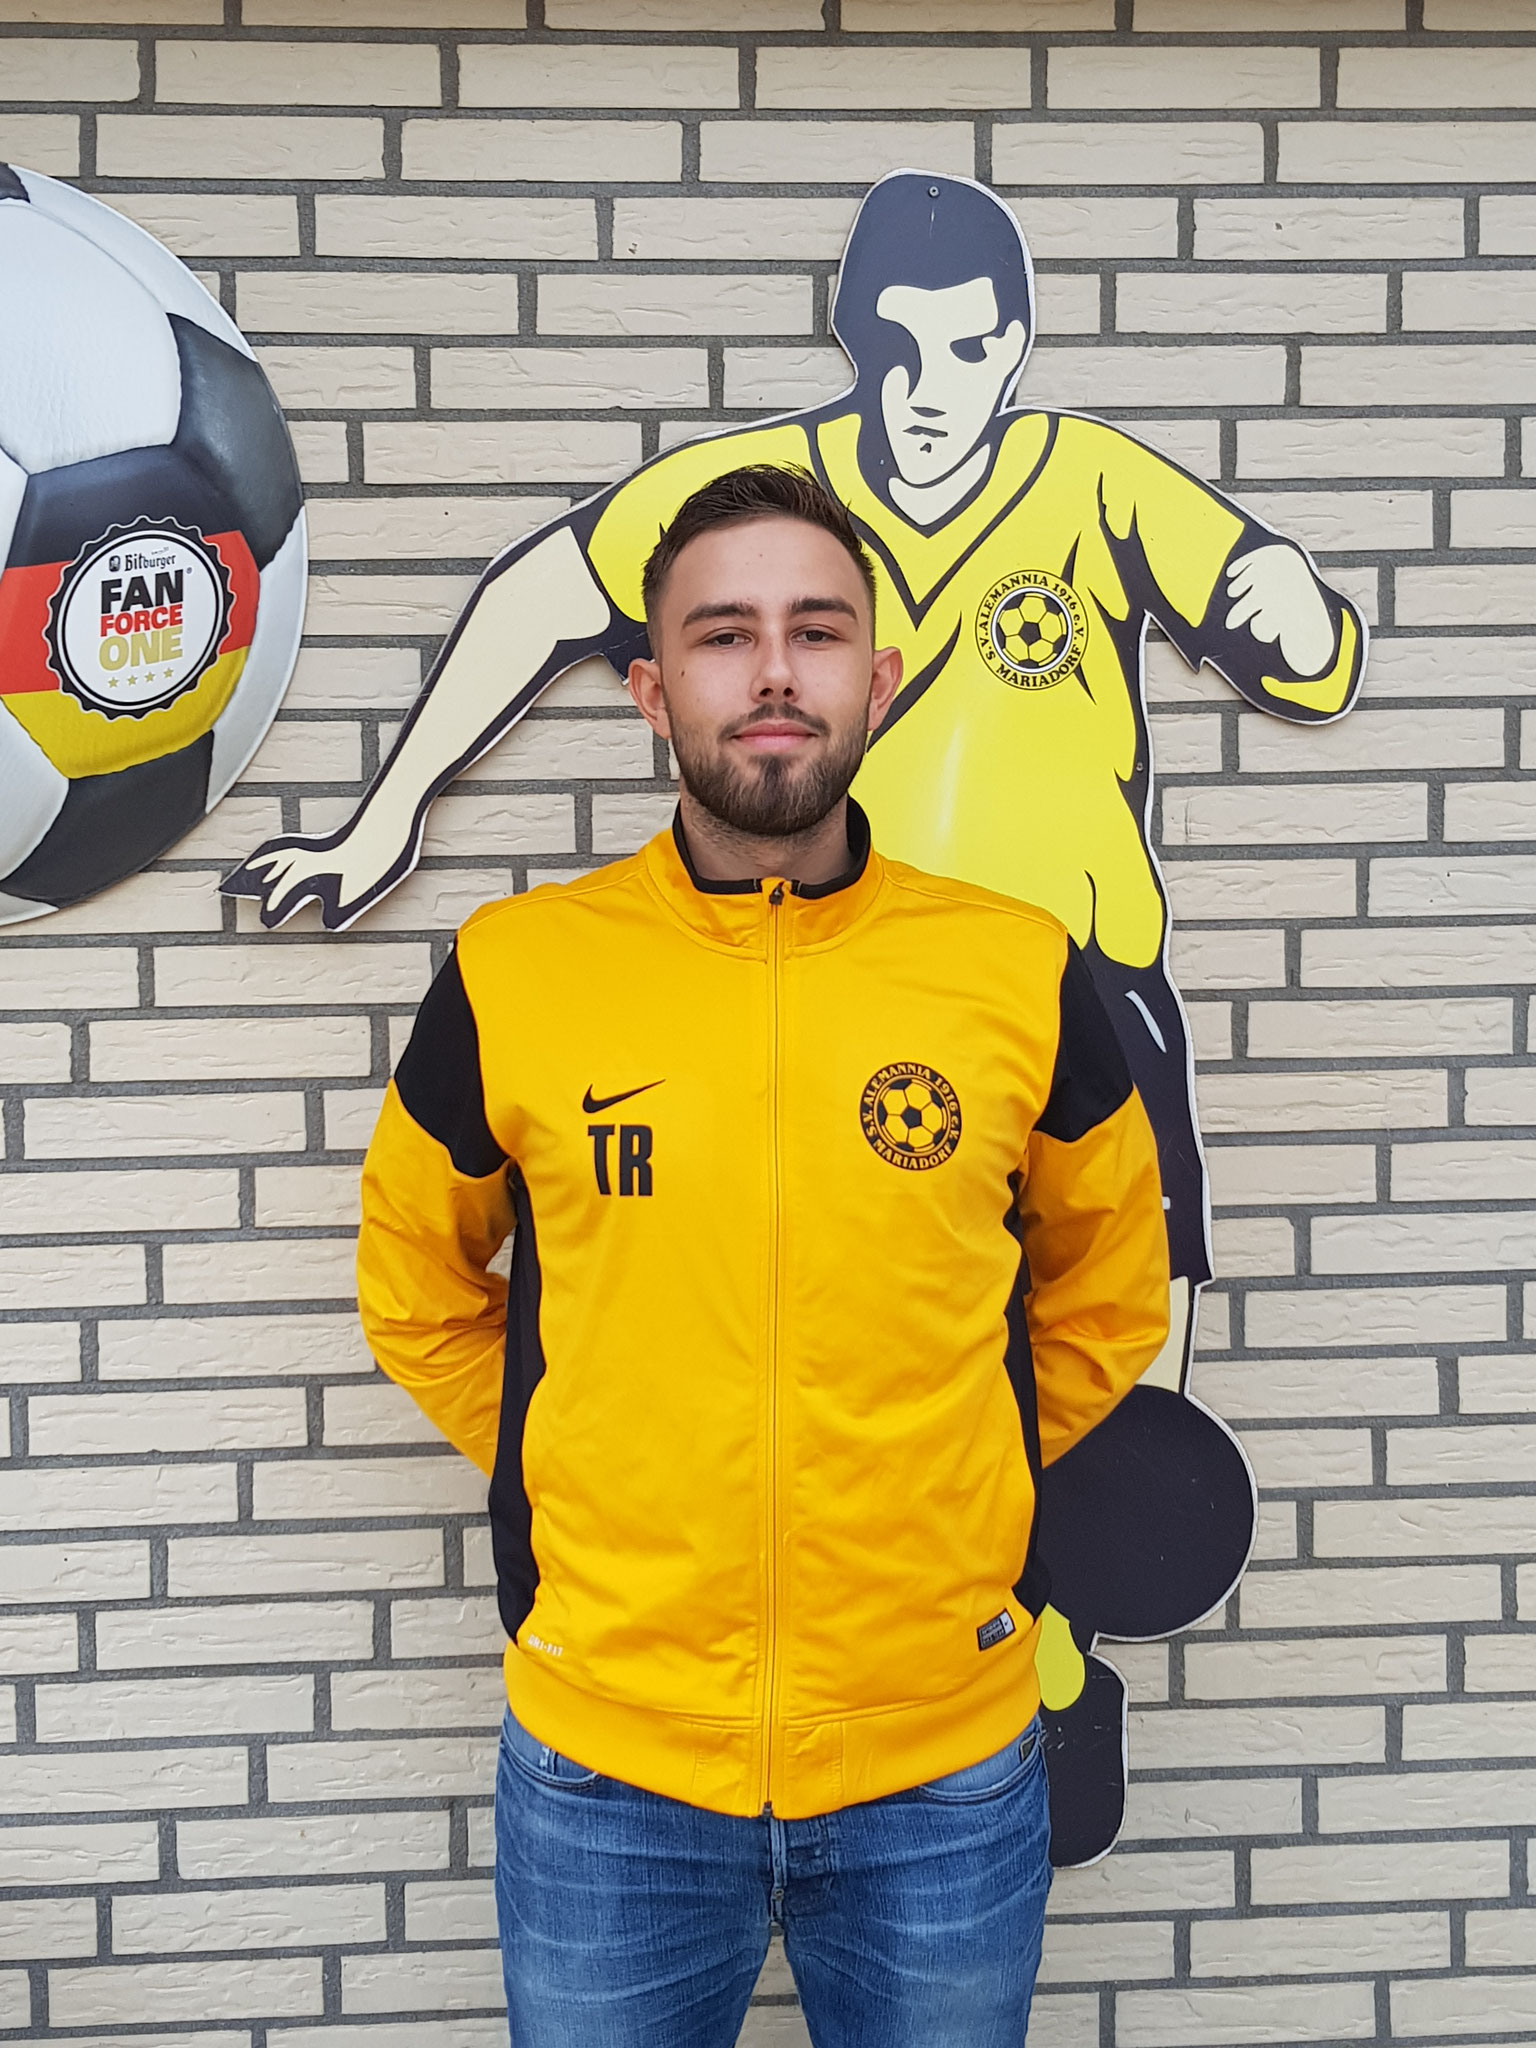 Trainer Jannik Morfeld